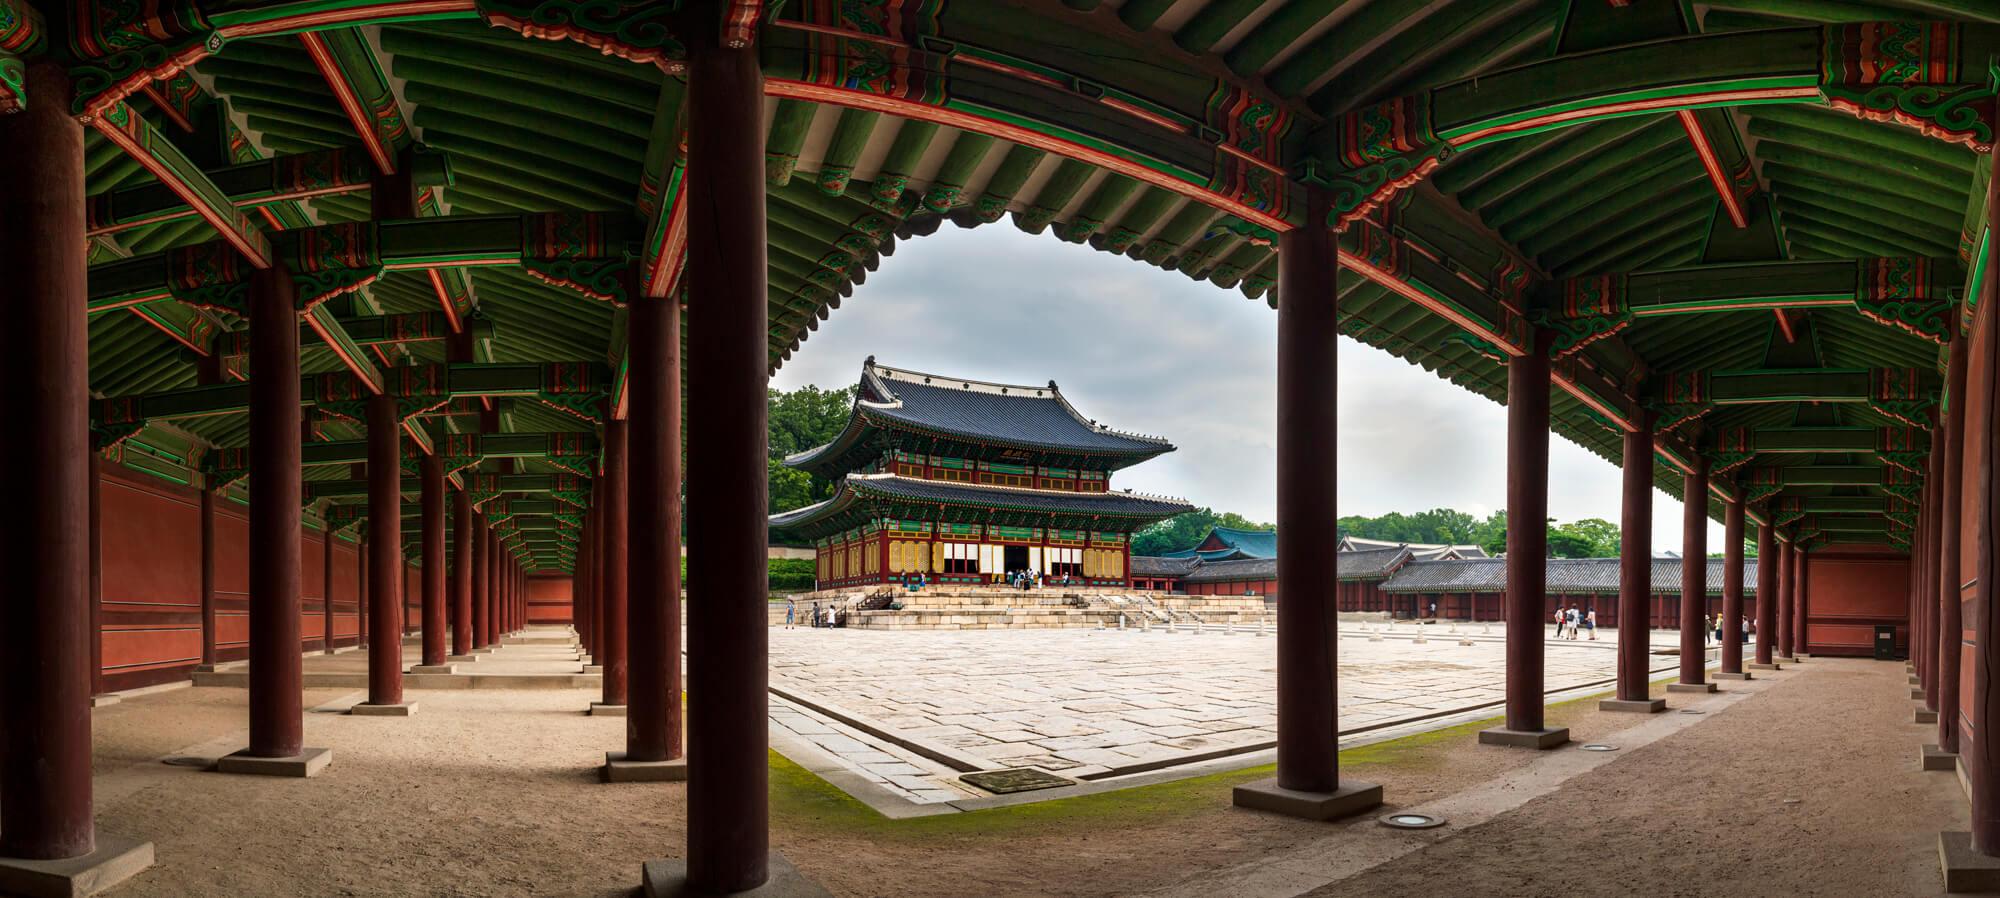 Južná Kórea palácové námestie